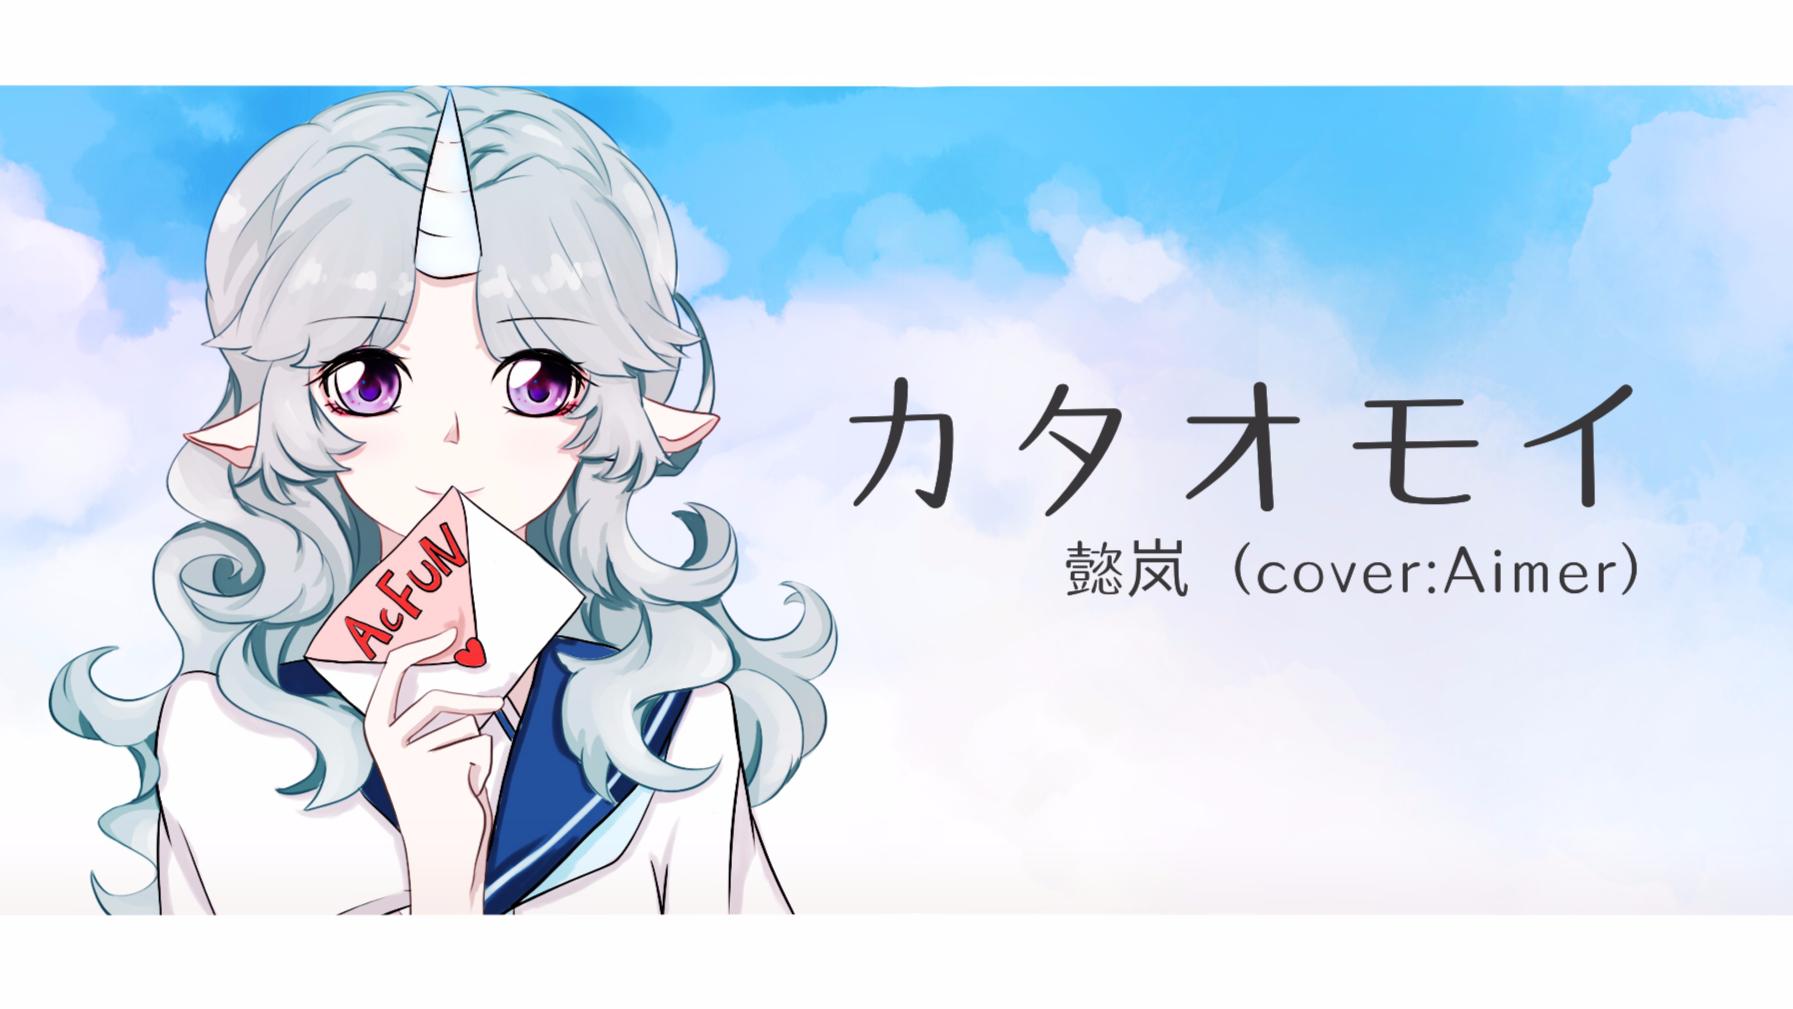 【懿岚】单相思(cover:Aimer)